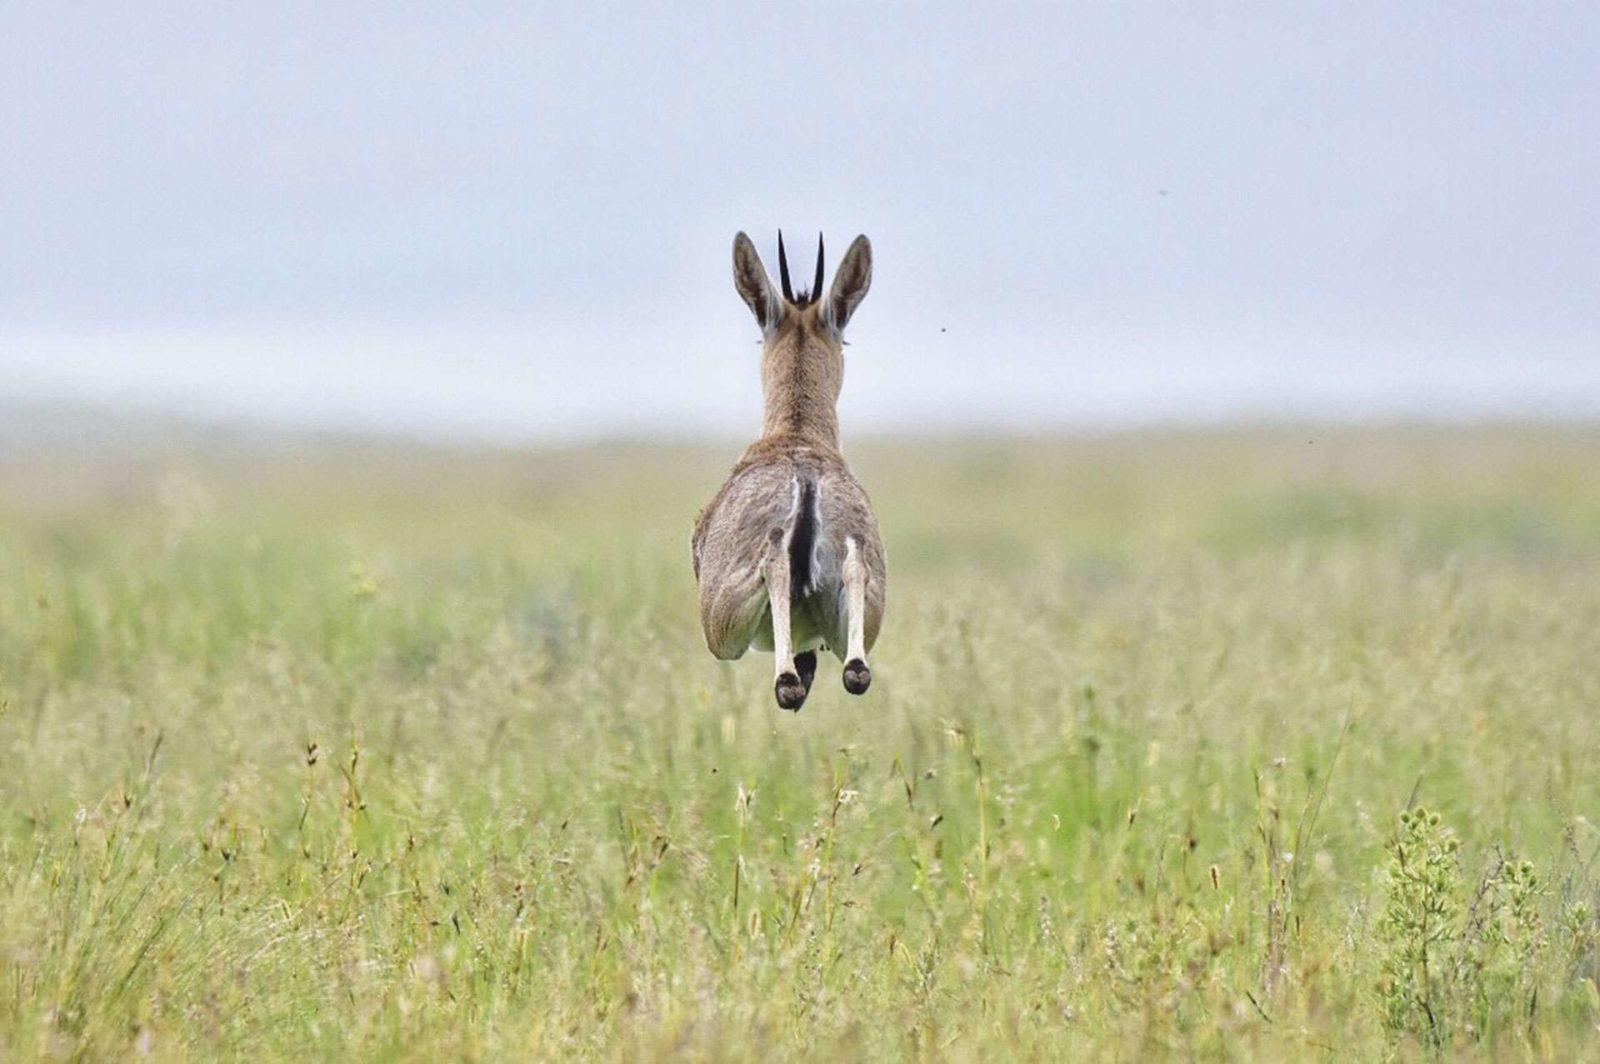 Local wildlife freely wander